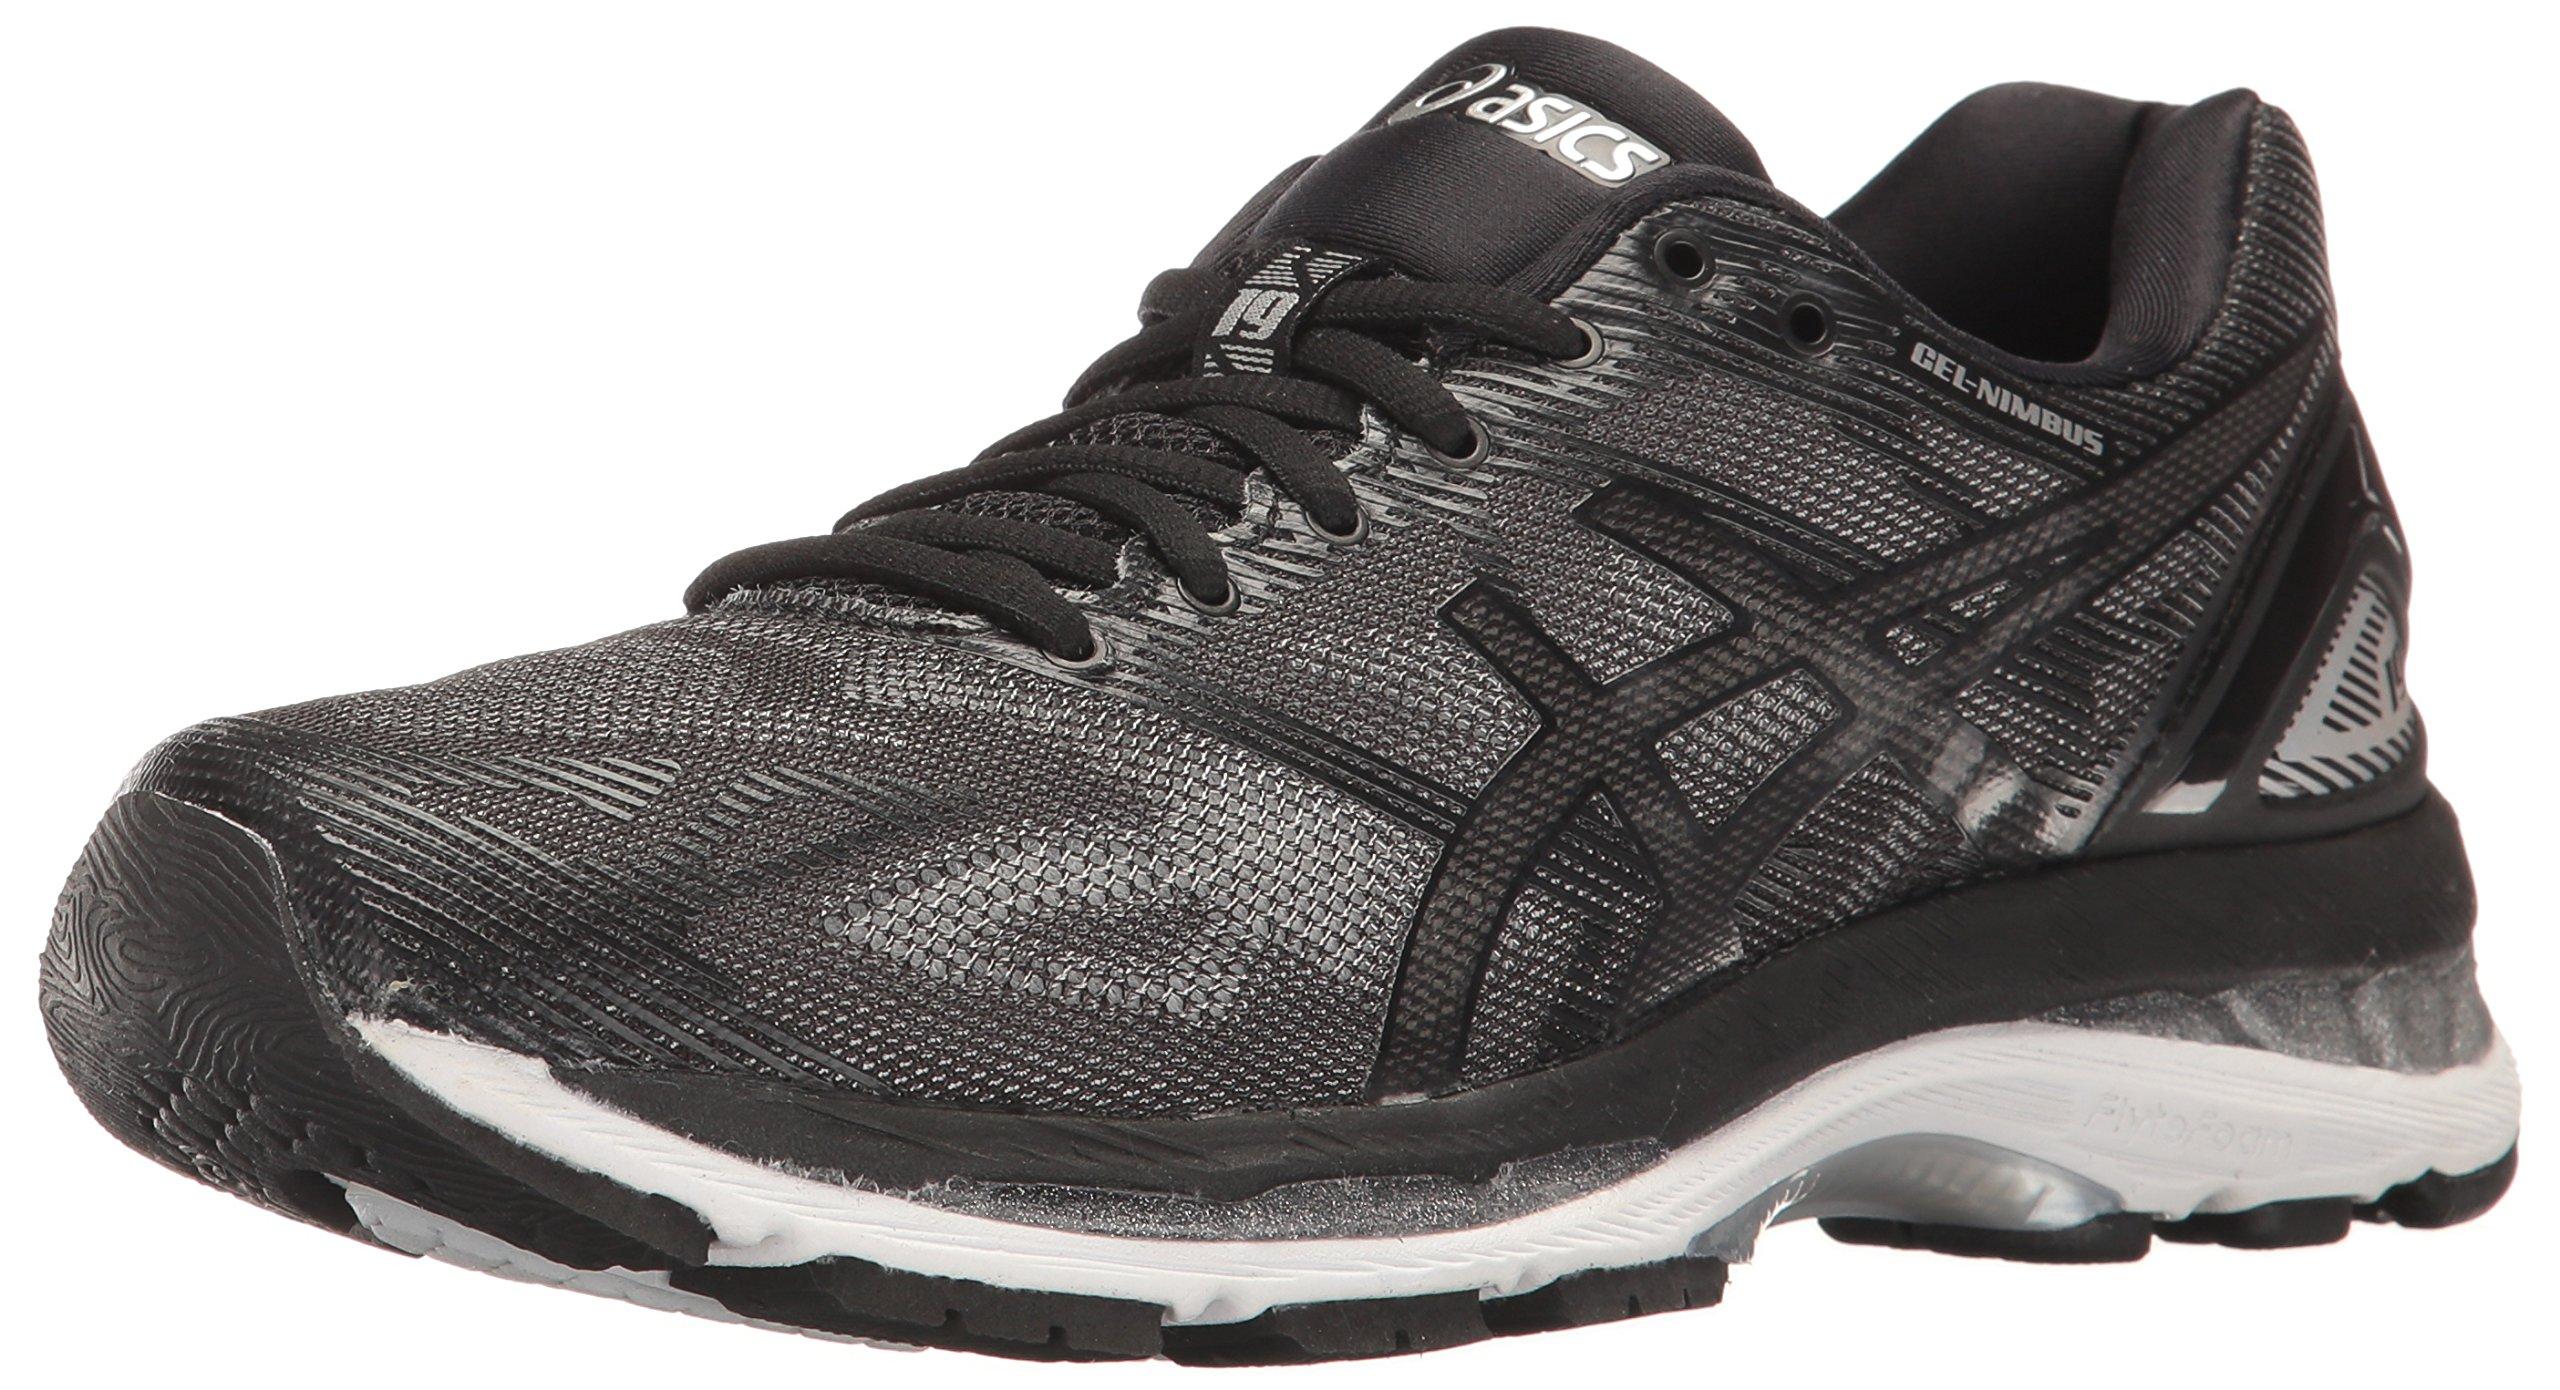 ASICS Women's Gel-Nimbus 19 Running Shoe, Black/Onyx/Silver, 8.5 M US